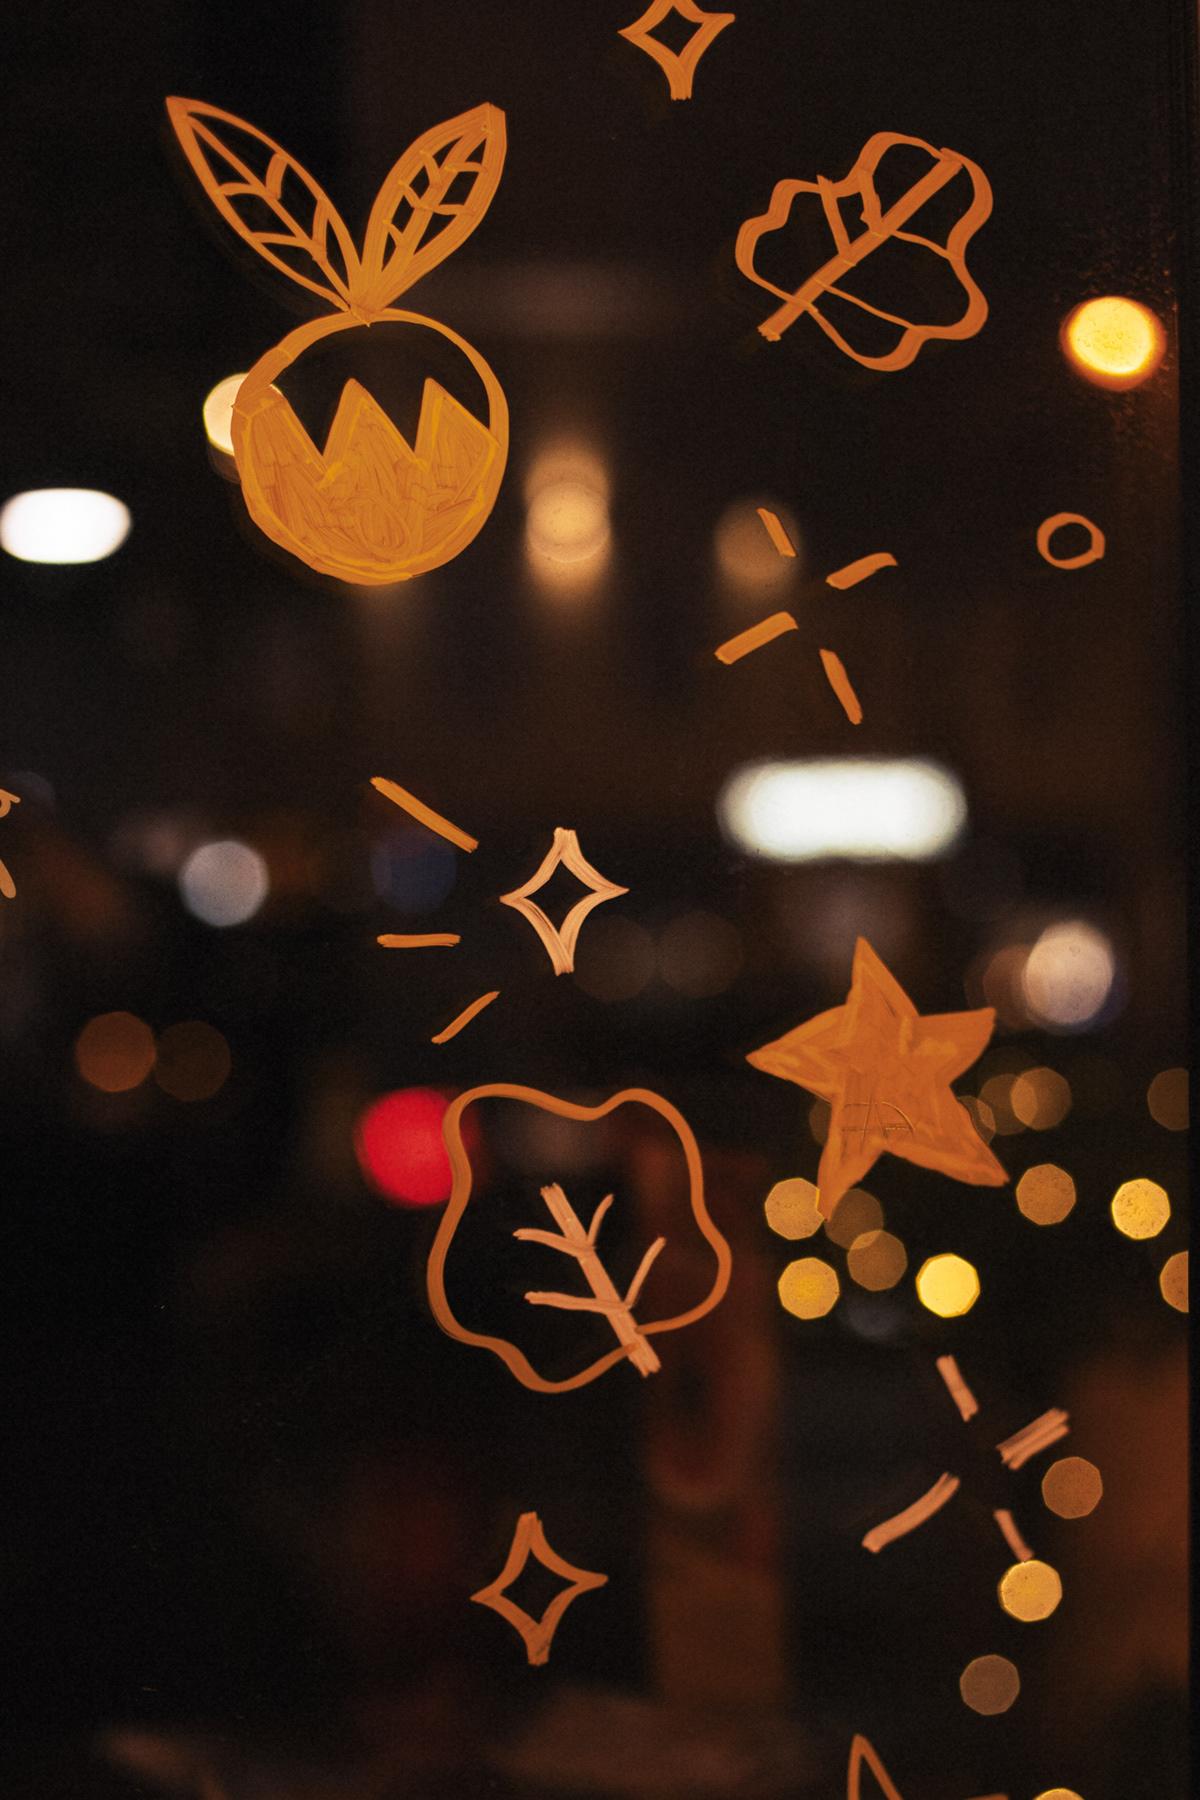 Christmas window drawing rabbit line illustration animals forest acrylic restaurant Food  decoration